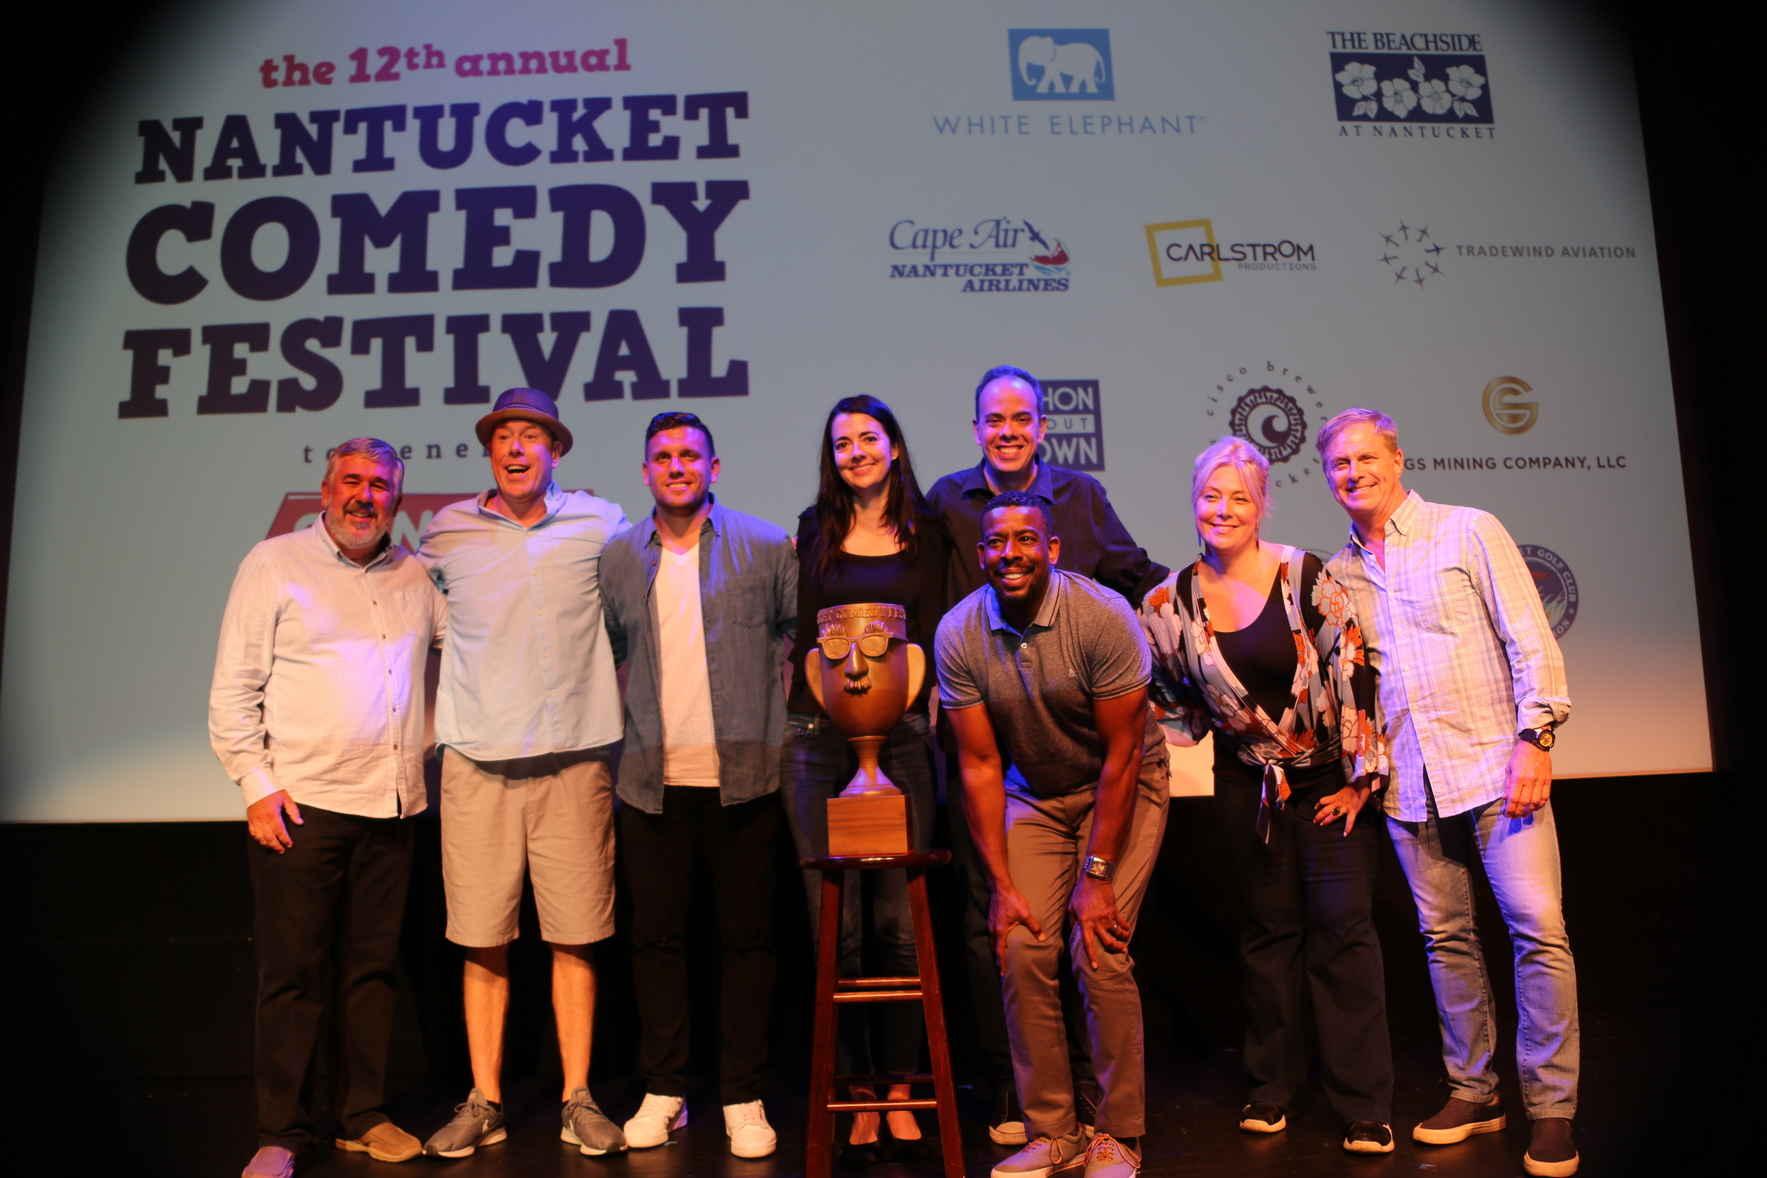 Nantucket Comedy Festival Patron Passes 2020 image